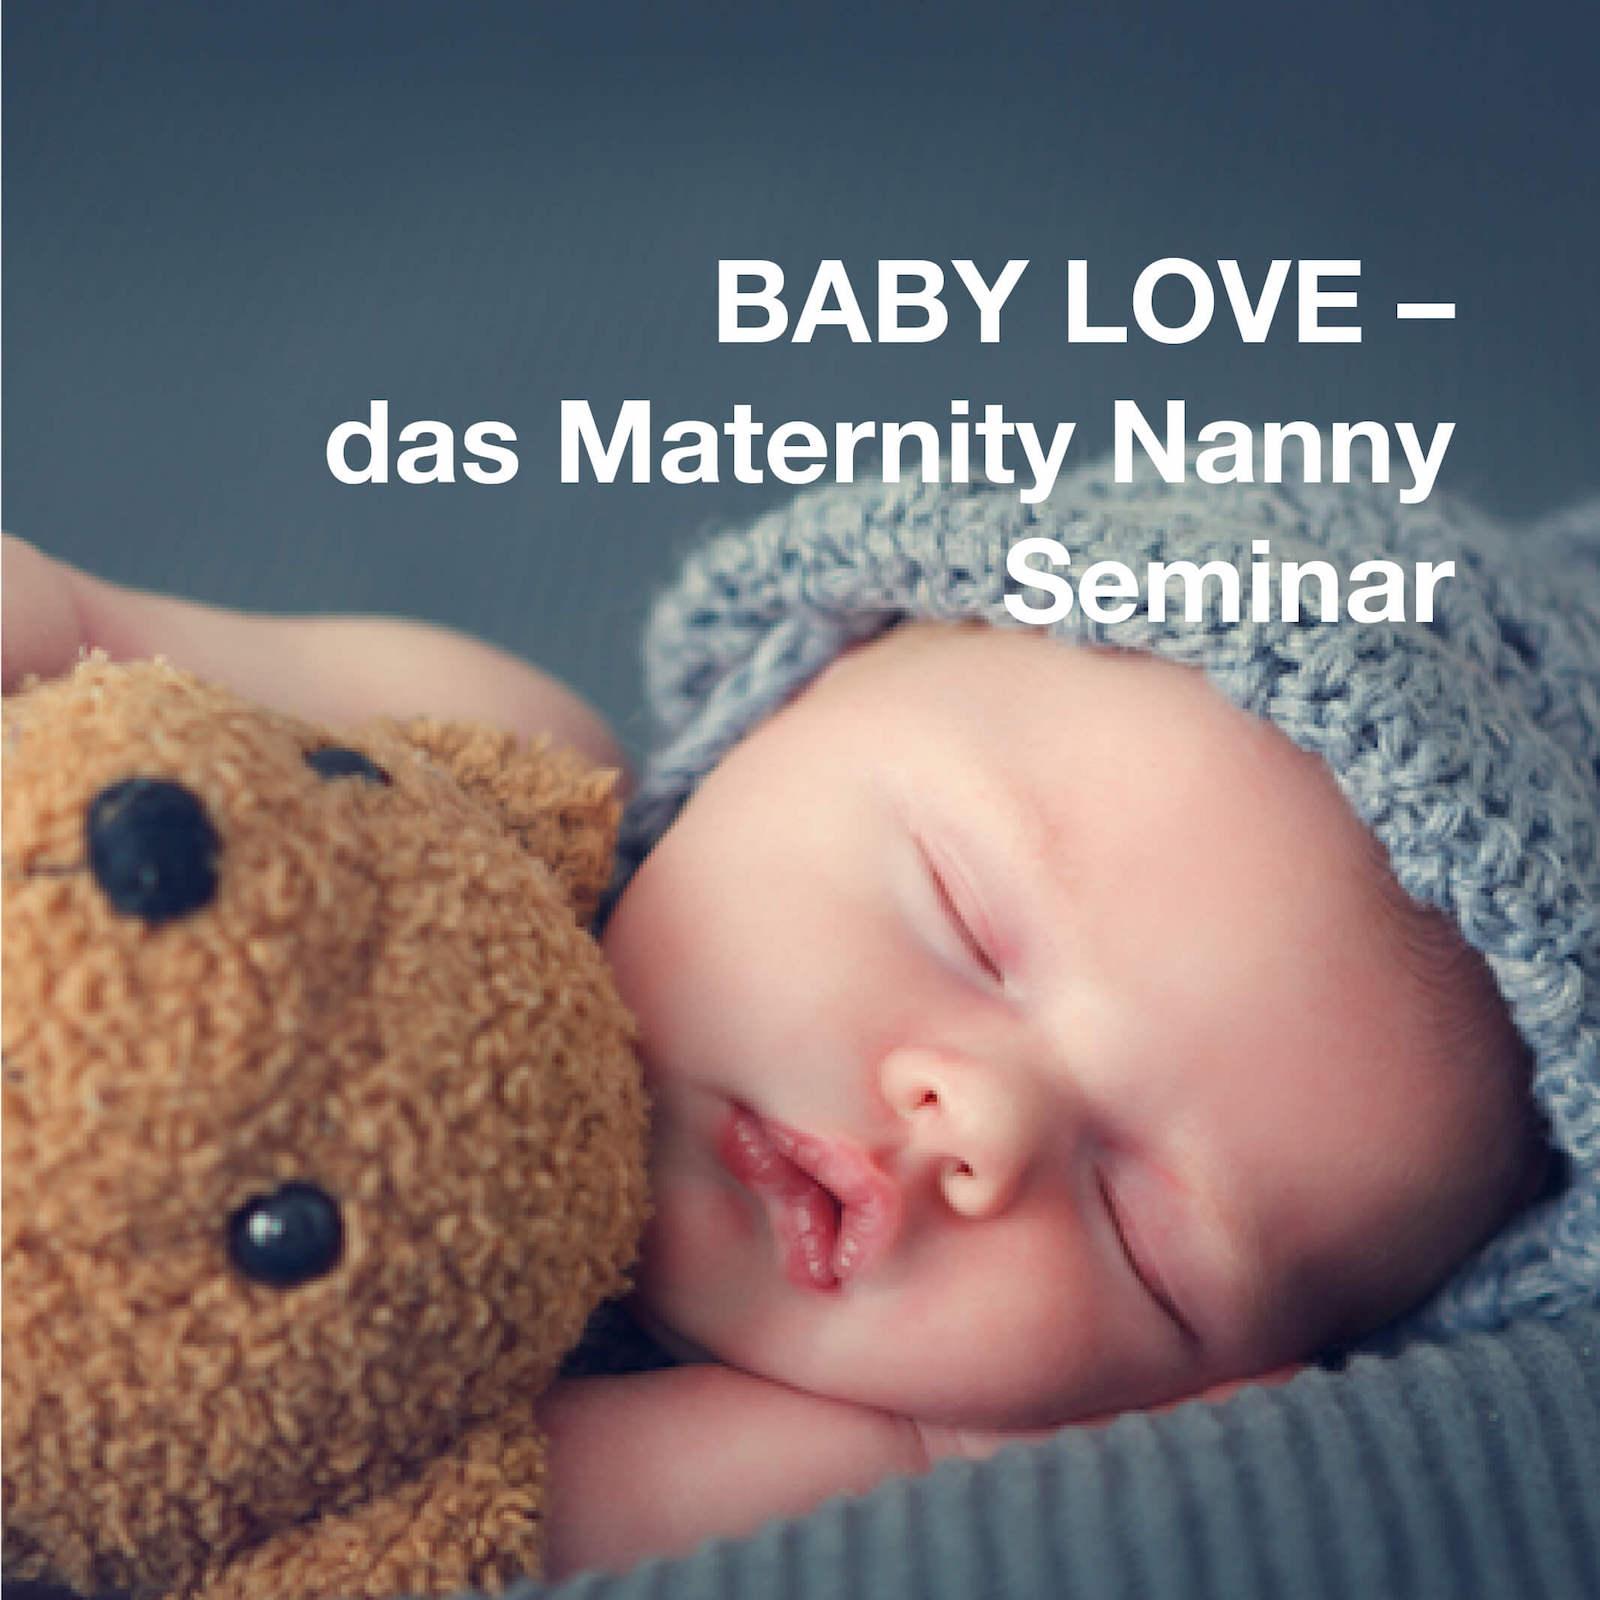 Das 3-Tages Maternity Nanny Seminar der Nanny Akademie